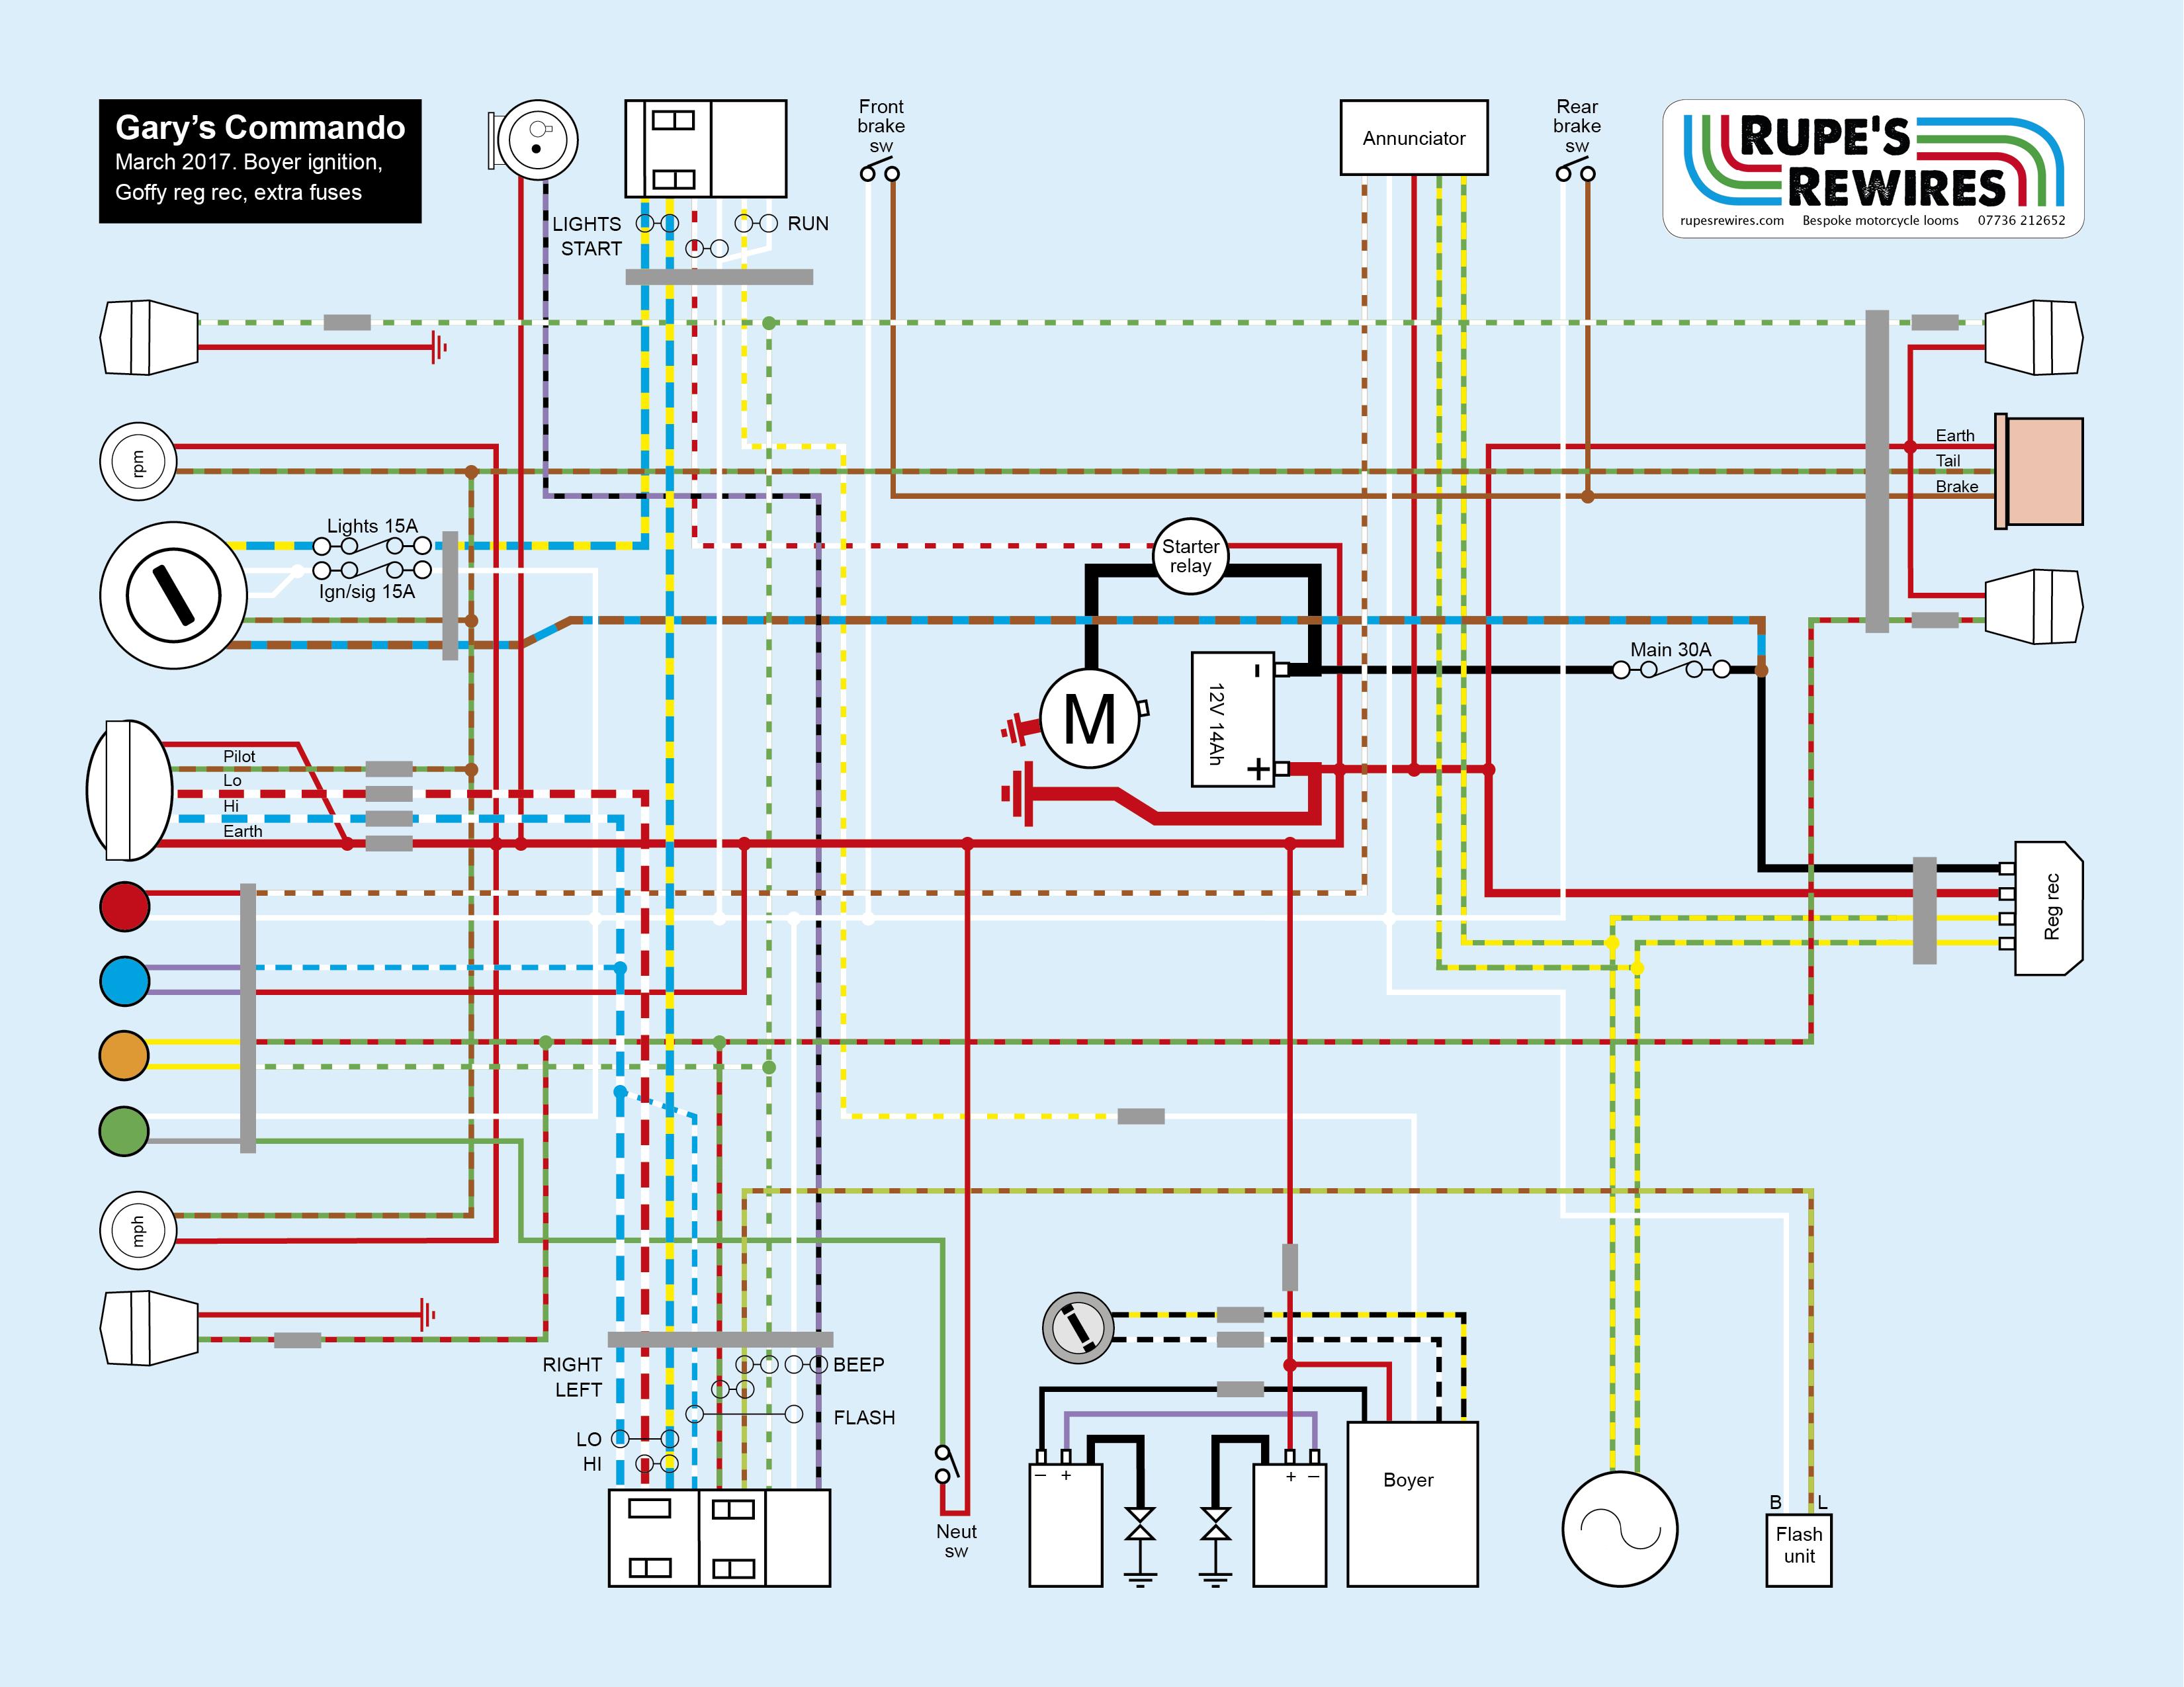 Garys Commando Rupes Rewires Boyer Ignition Wiring Diagram